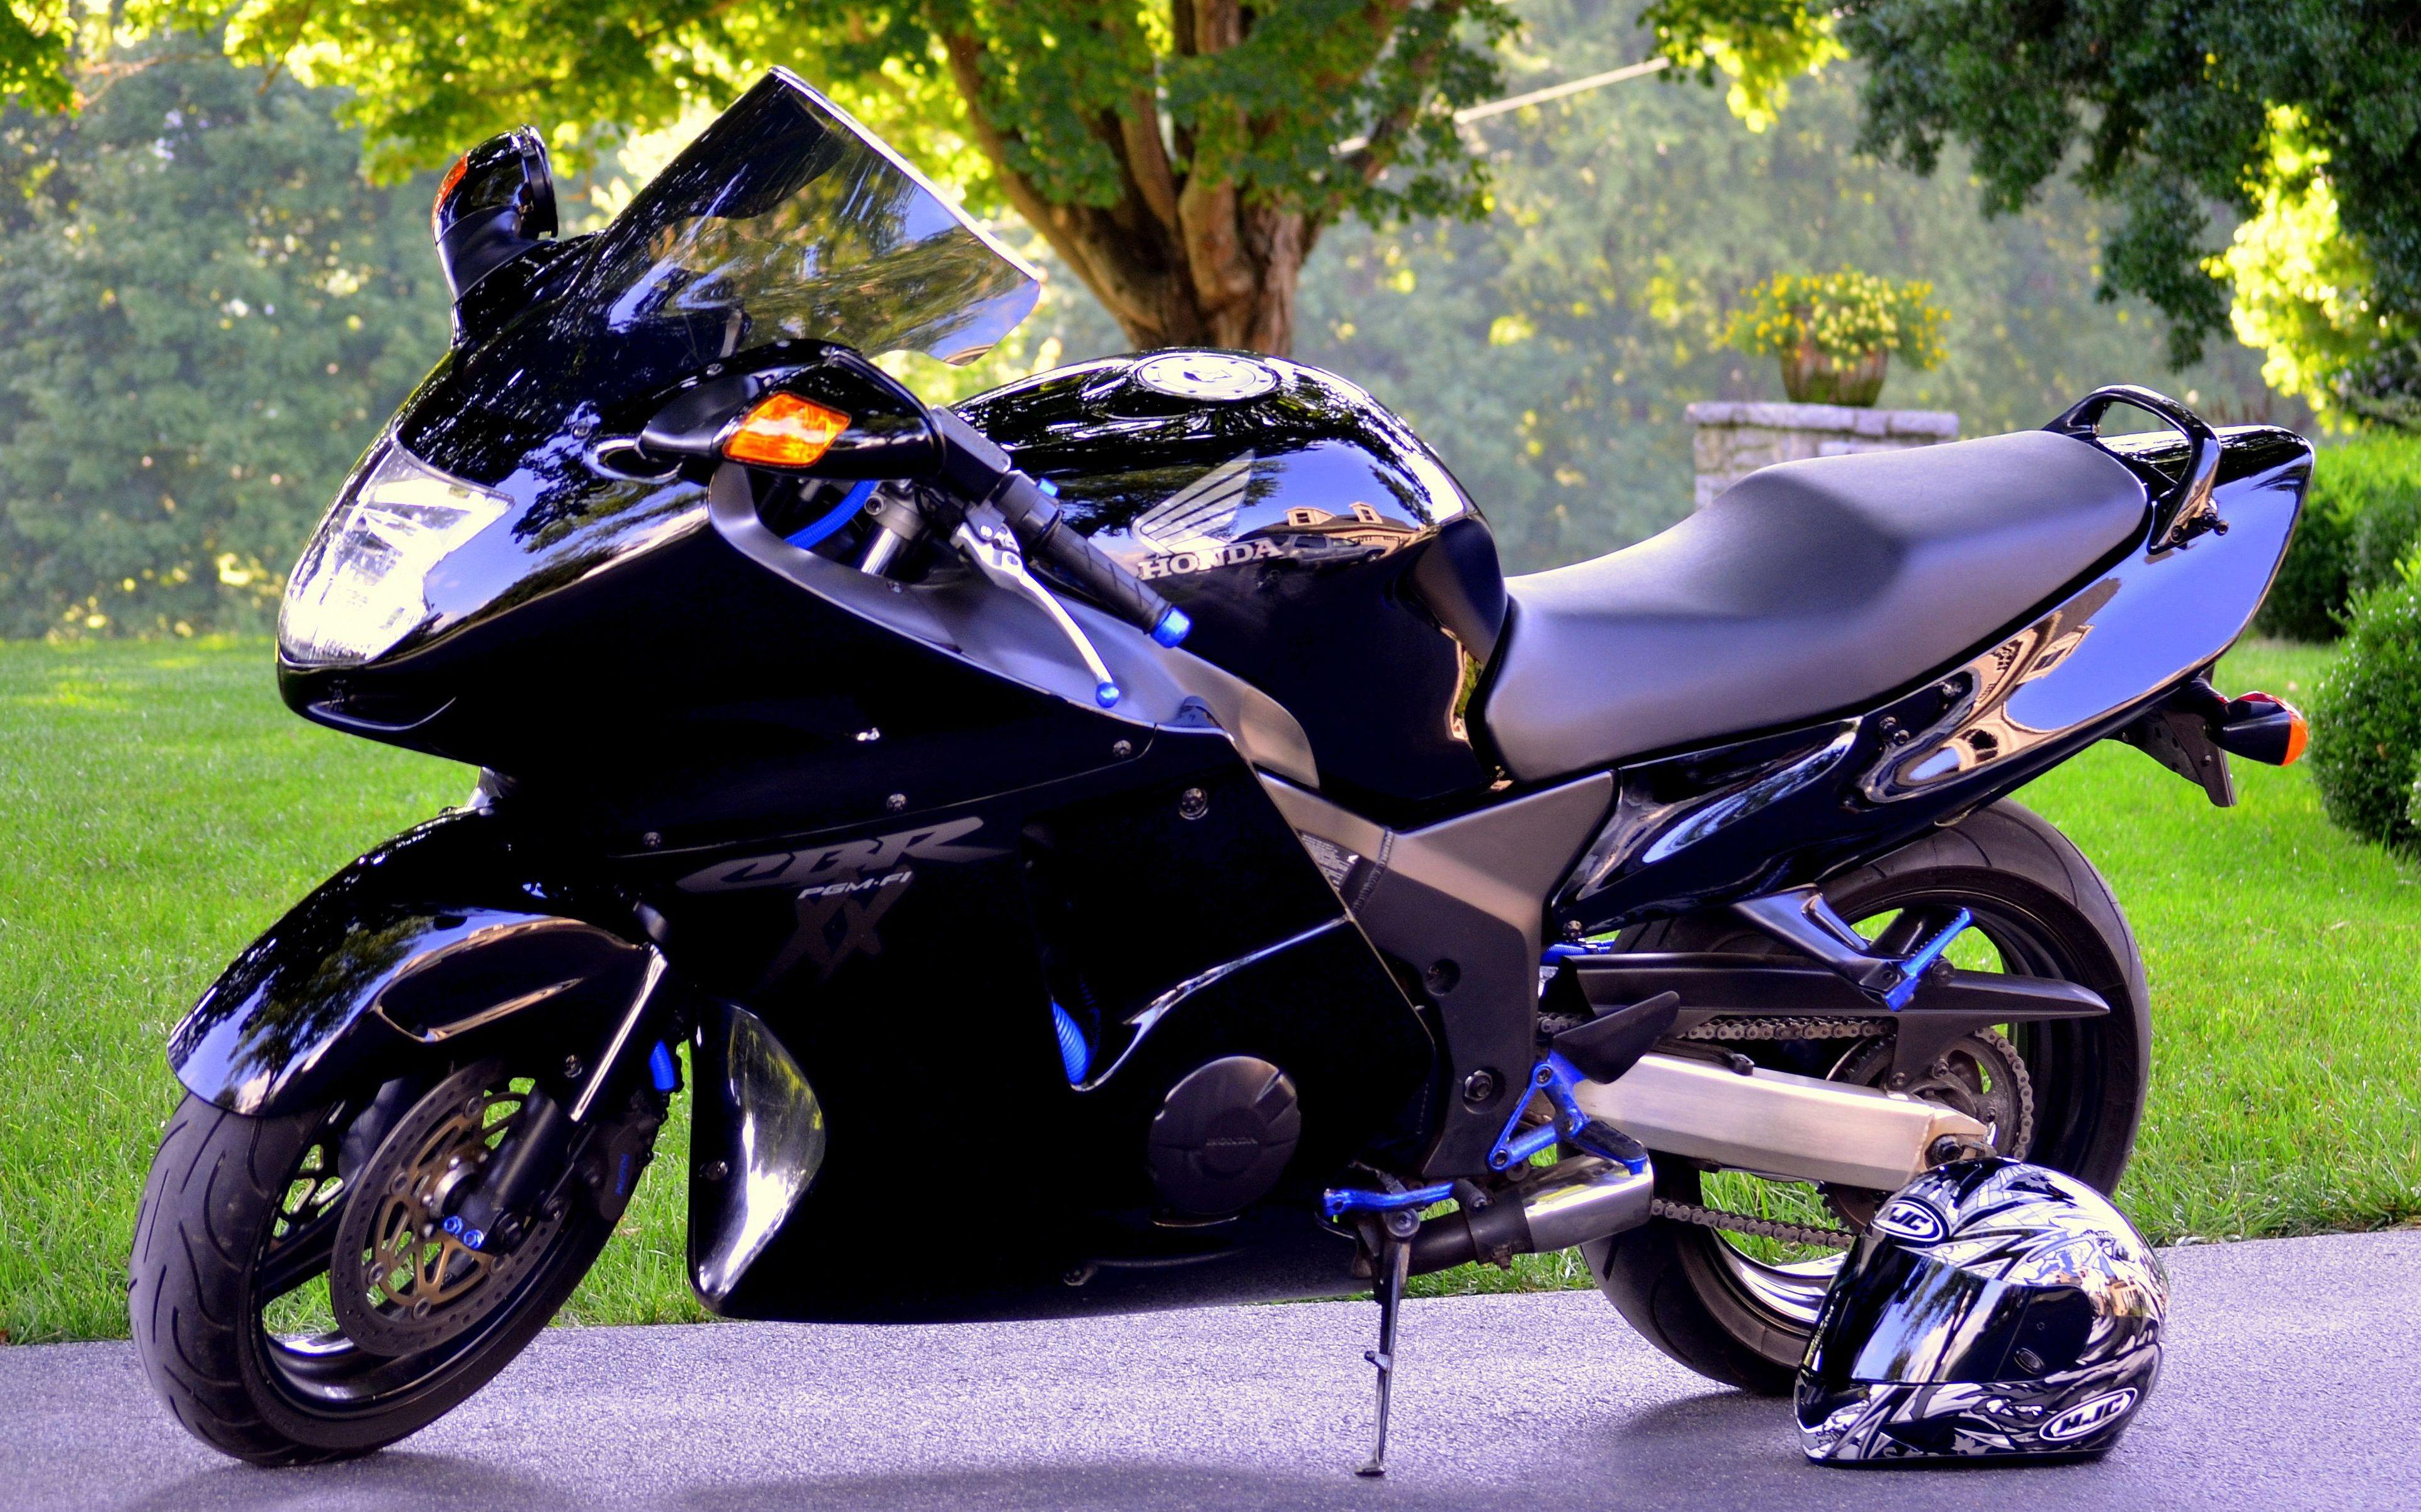 Honda Cbr1100xx Blackbird Price 8650 Engine Size 1137cc Top Speed